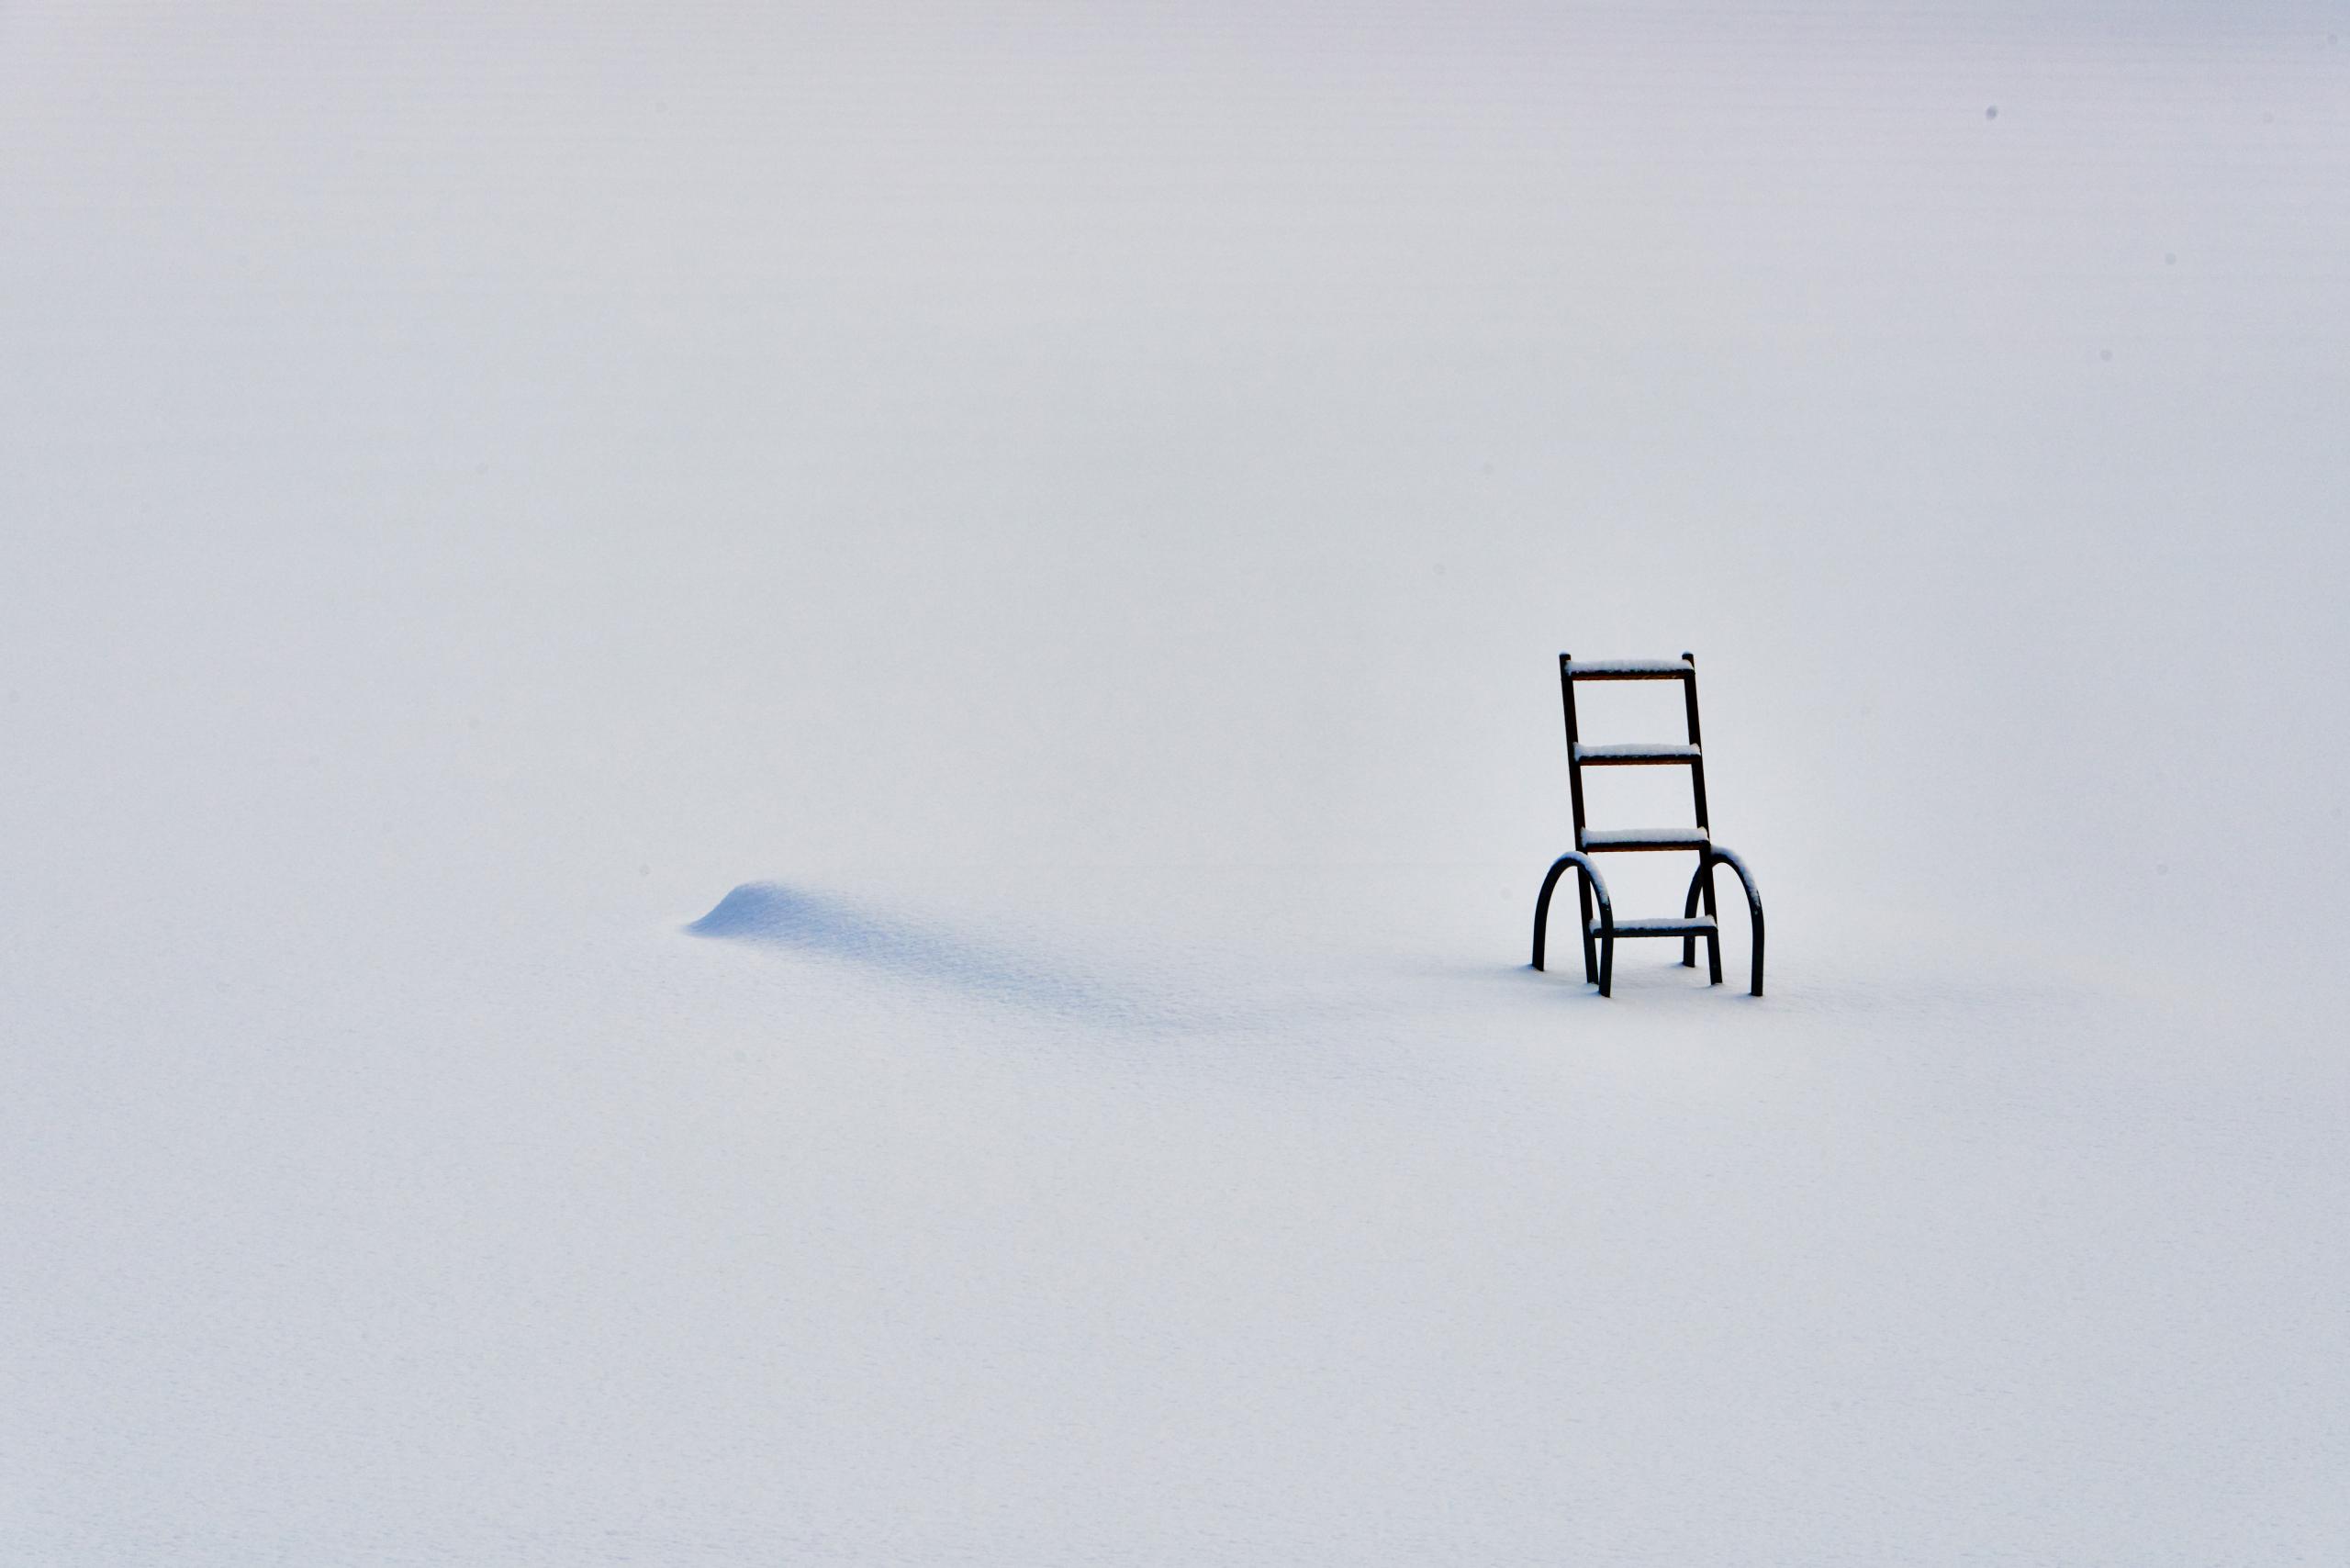 Chris Lashbrook, Parry Sound Ice Ladder, 2015